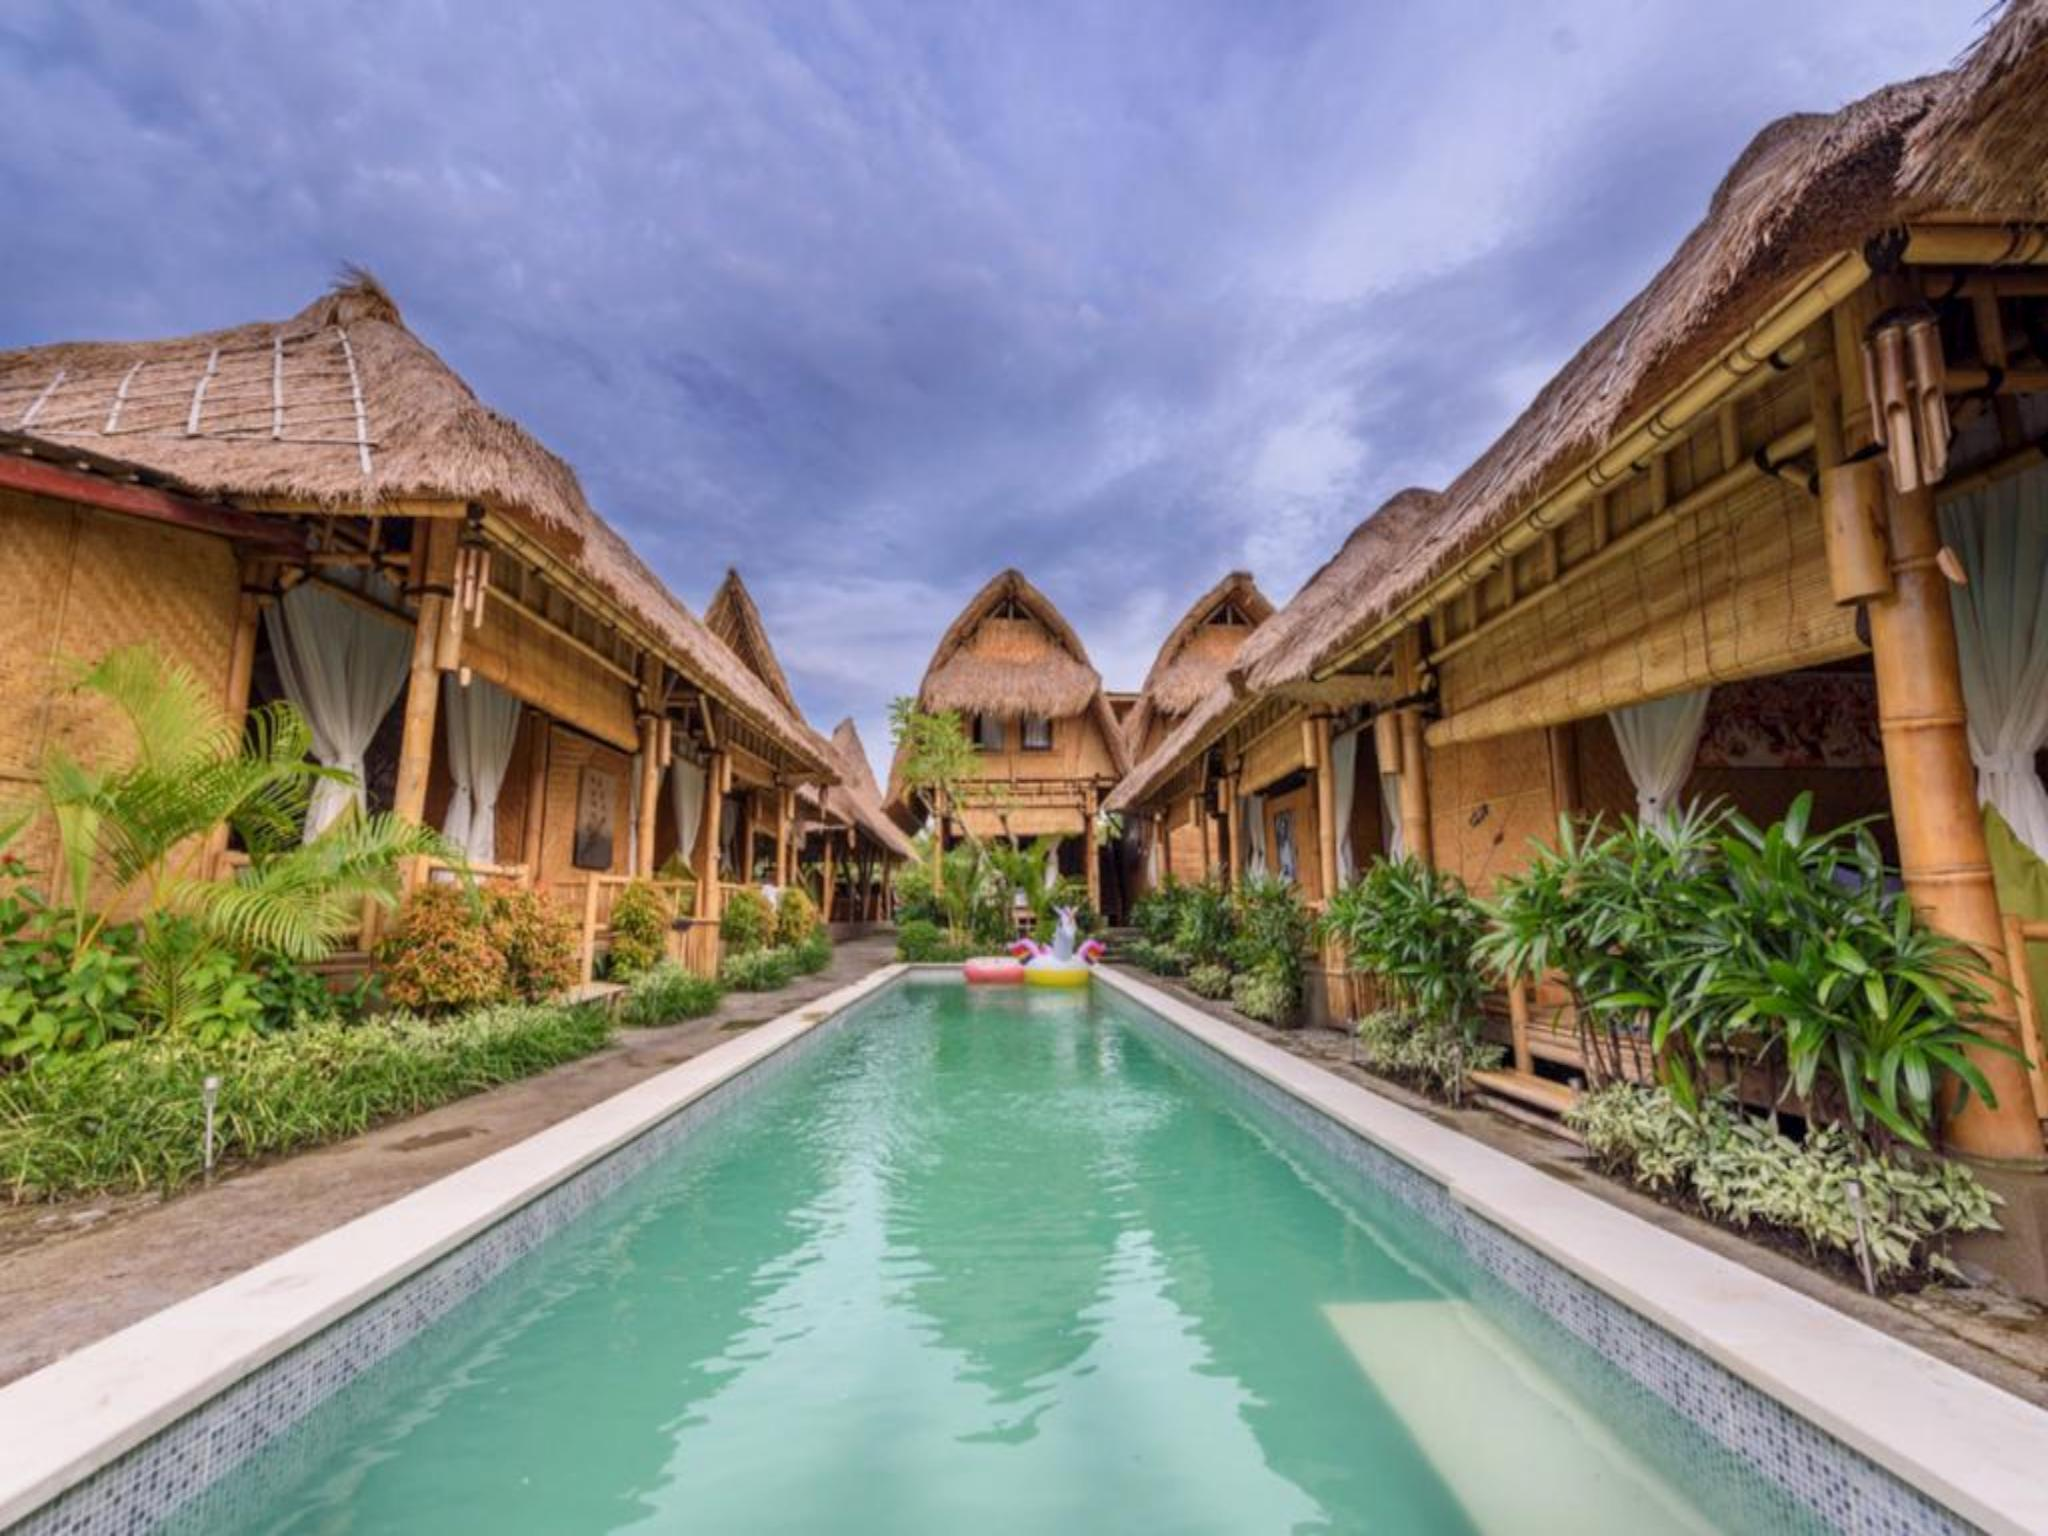 Moon Bamboo Villas Bali 2 Star Hotel In Bali Indonesia